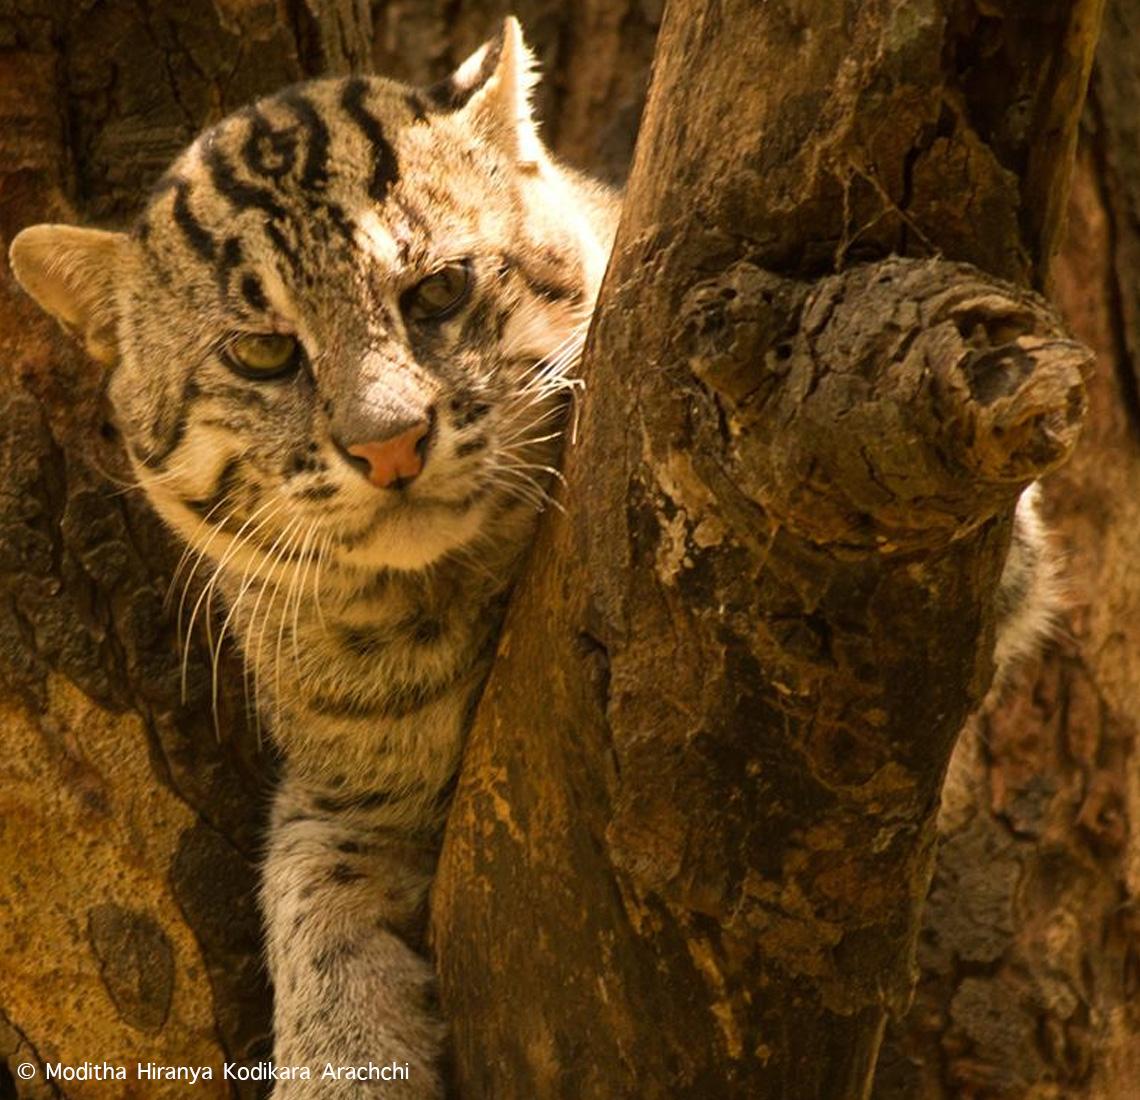 Searching-for-fishing-cats_Moditha-Hiranya-Kodikara-Arachchi